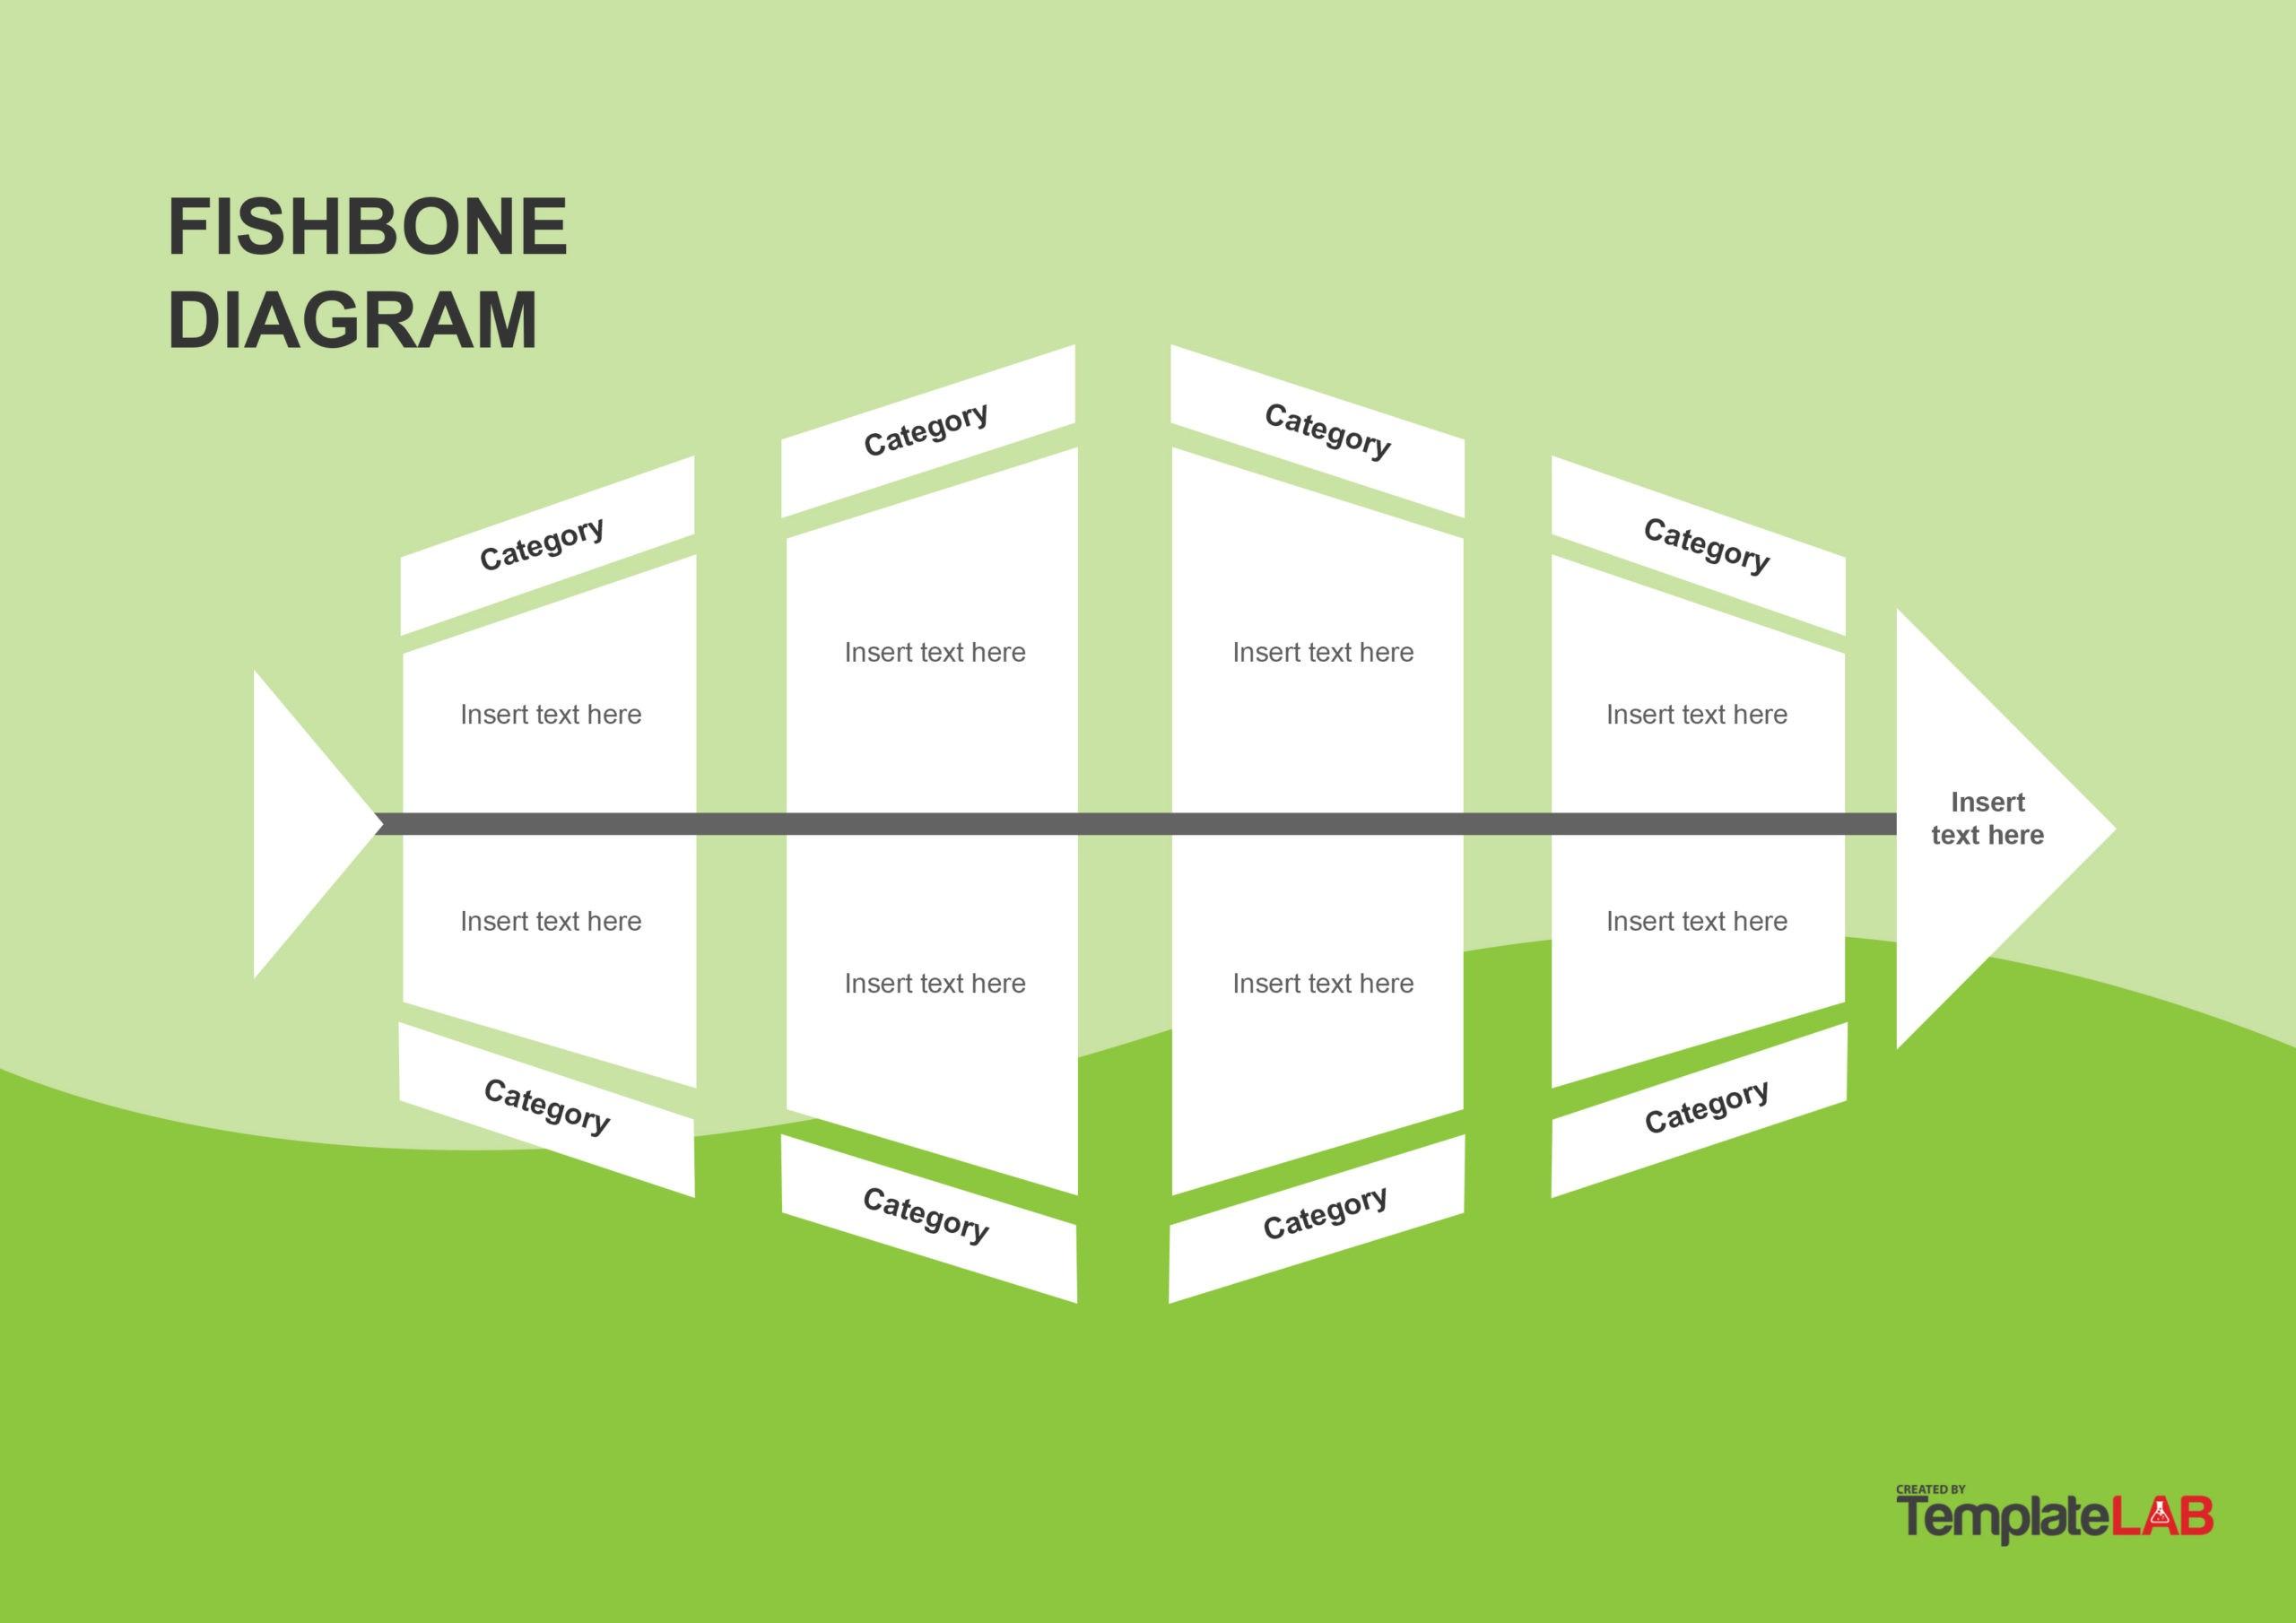 Free Fishbone Diagram Template 10 - TemplateLab.com